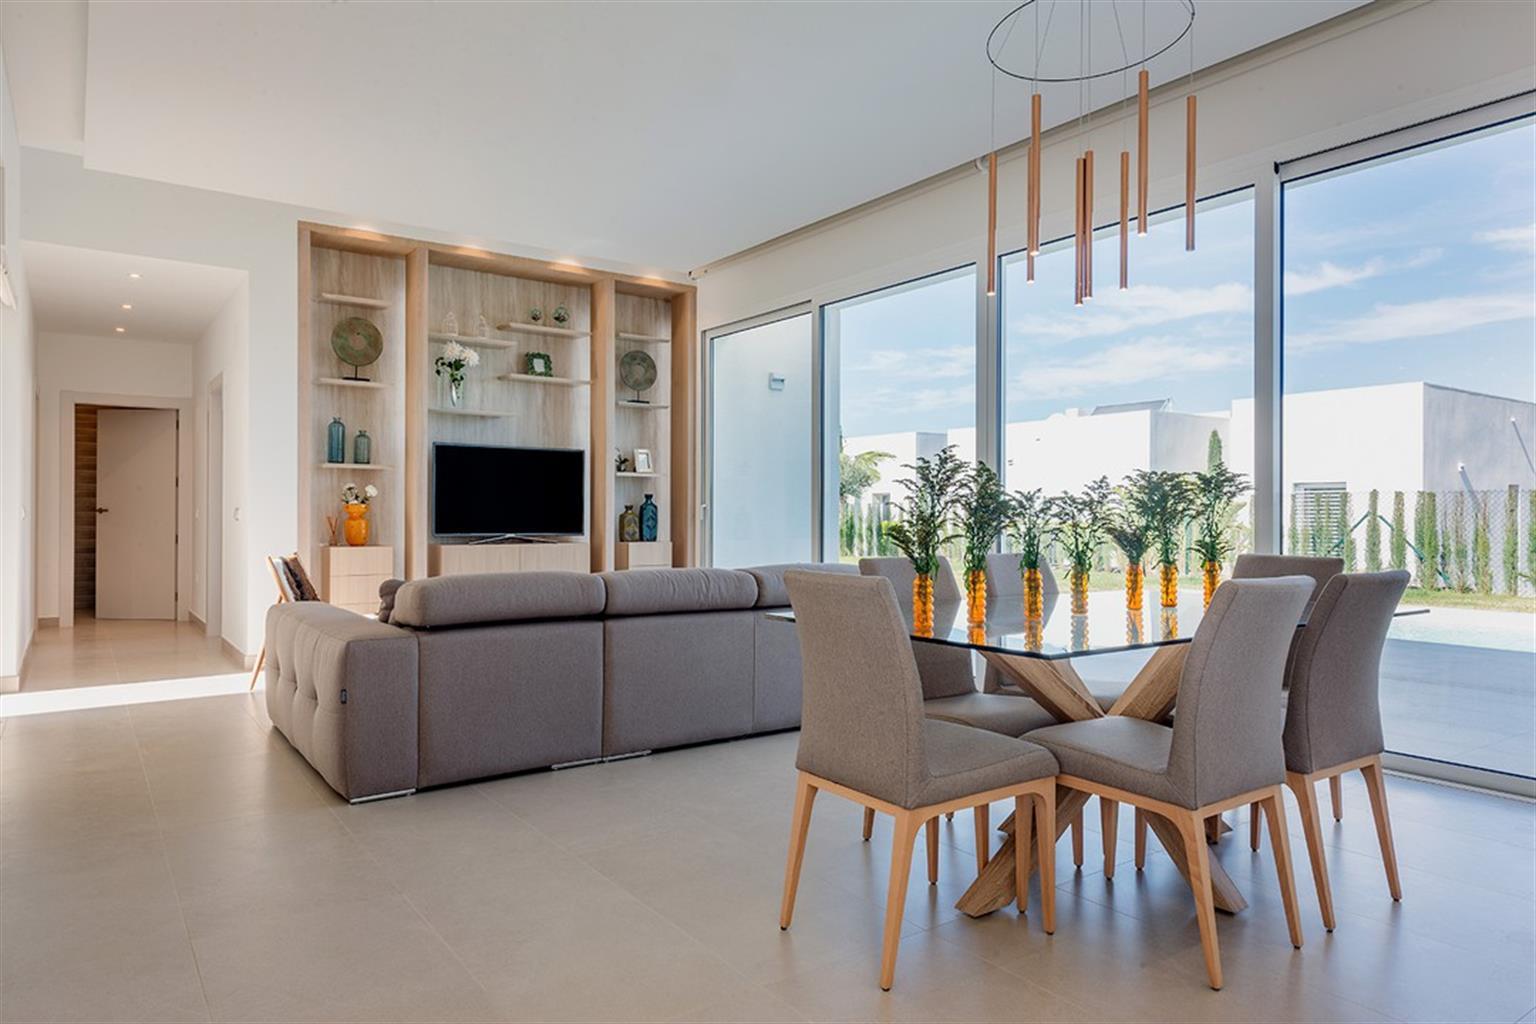 Maison - Villamartin - #4228155-14